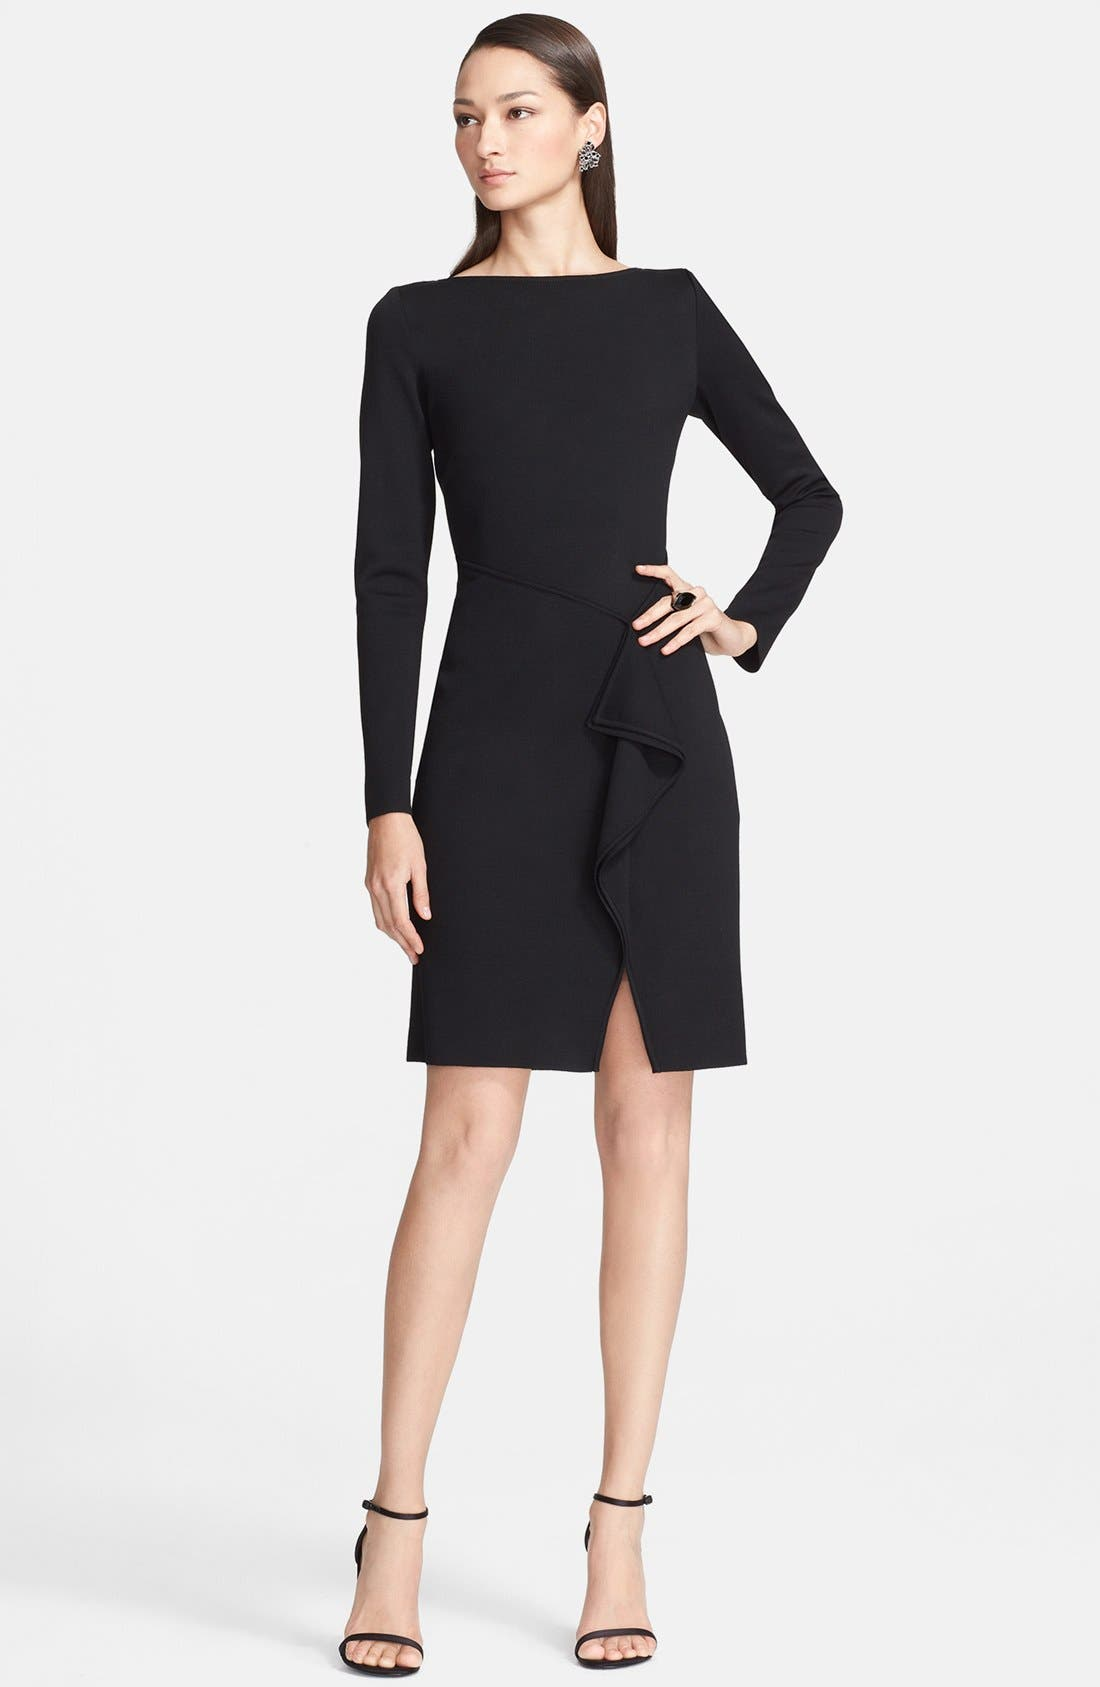 Alternate Image 1 Selected - St. John Collection Bateau Neck Drape Front Milano Knit Dress